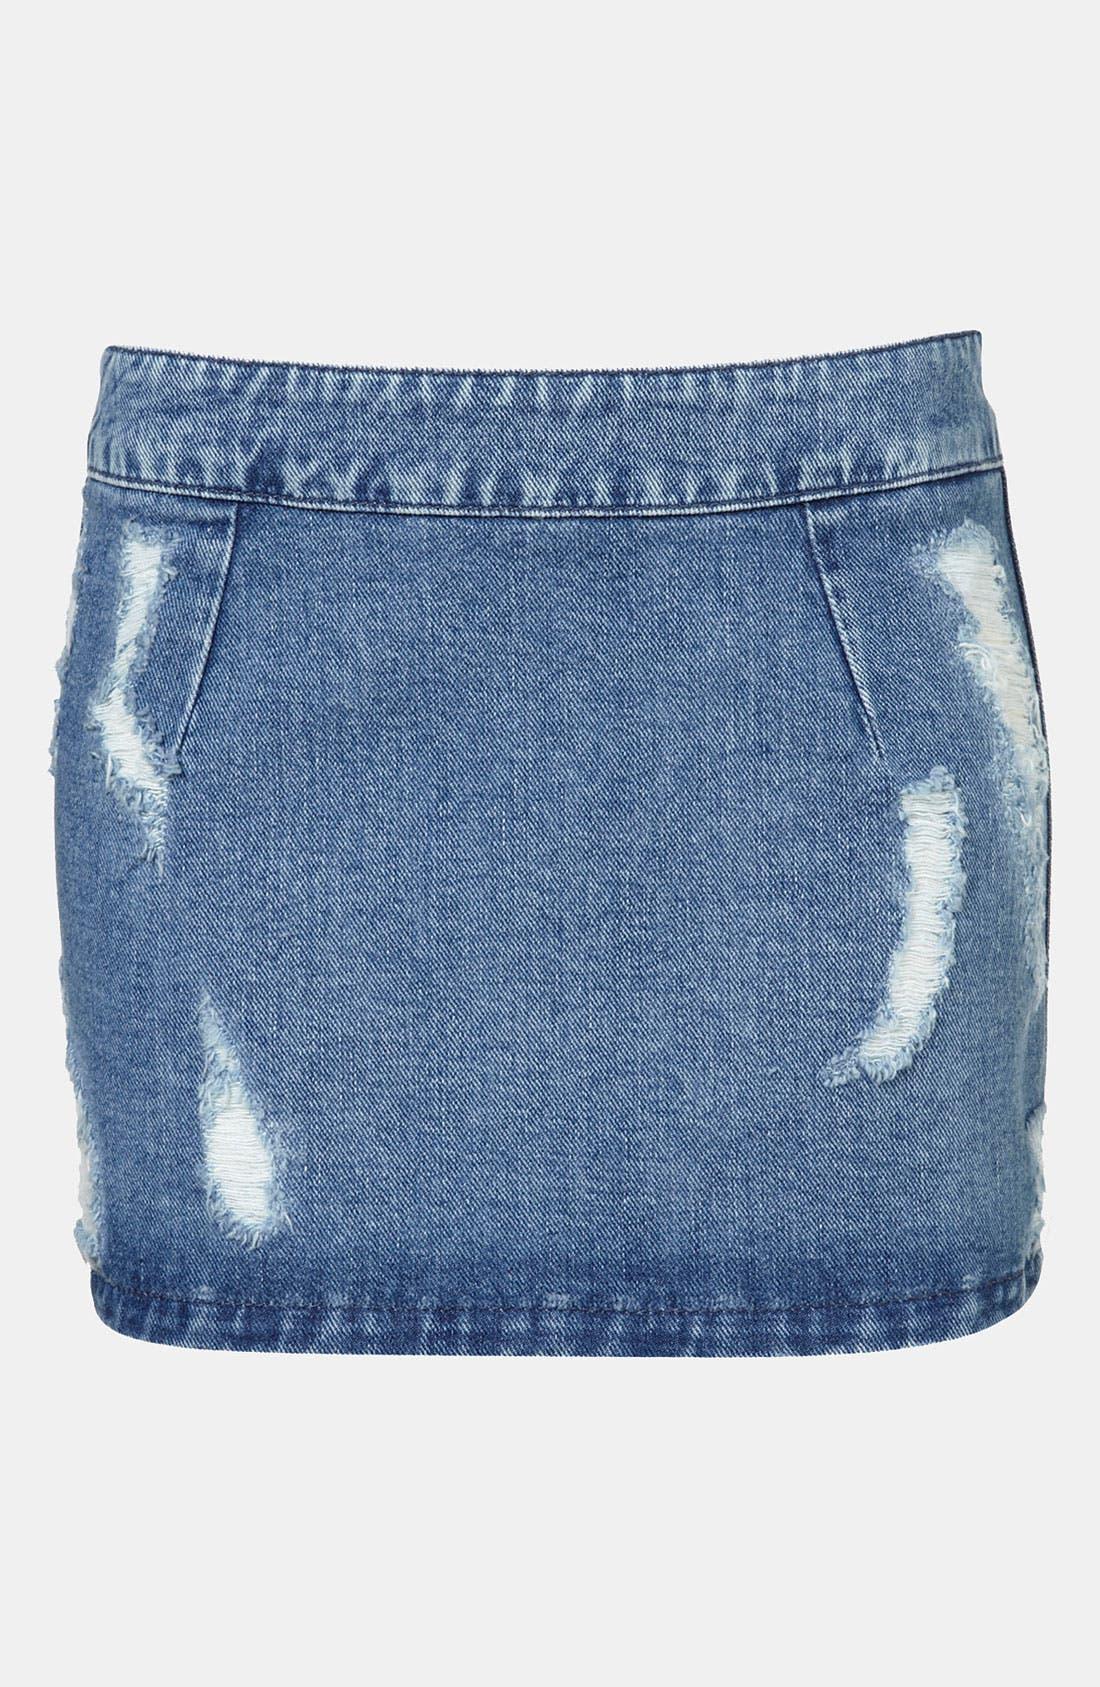 Alternate Image 1 Selected - Topshop Moto Distressed Denim Miniskirt